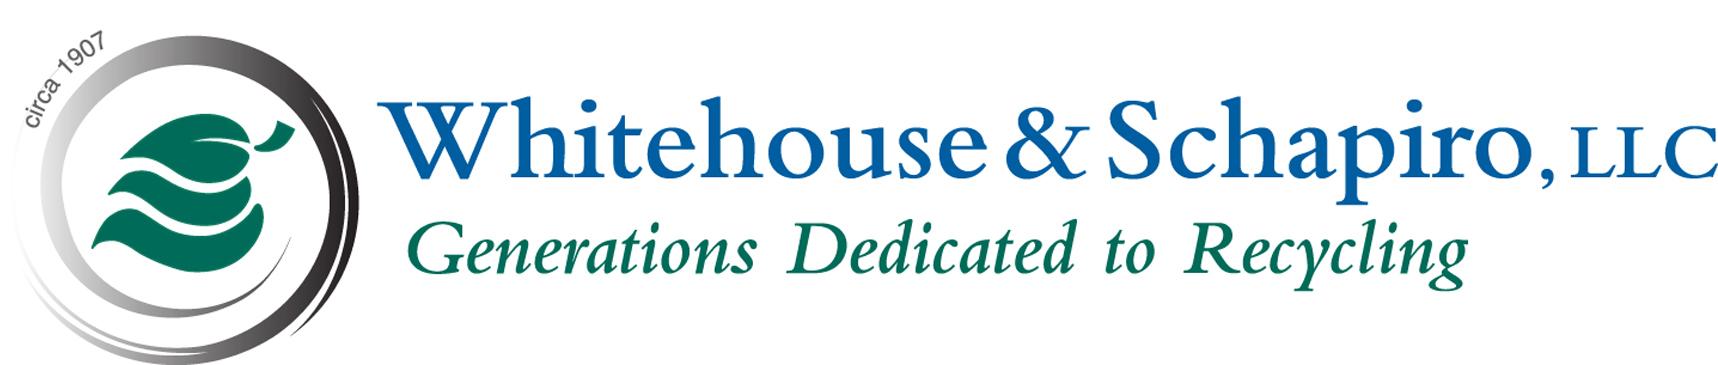 Whitehouse & Schapiro